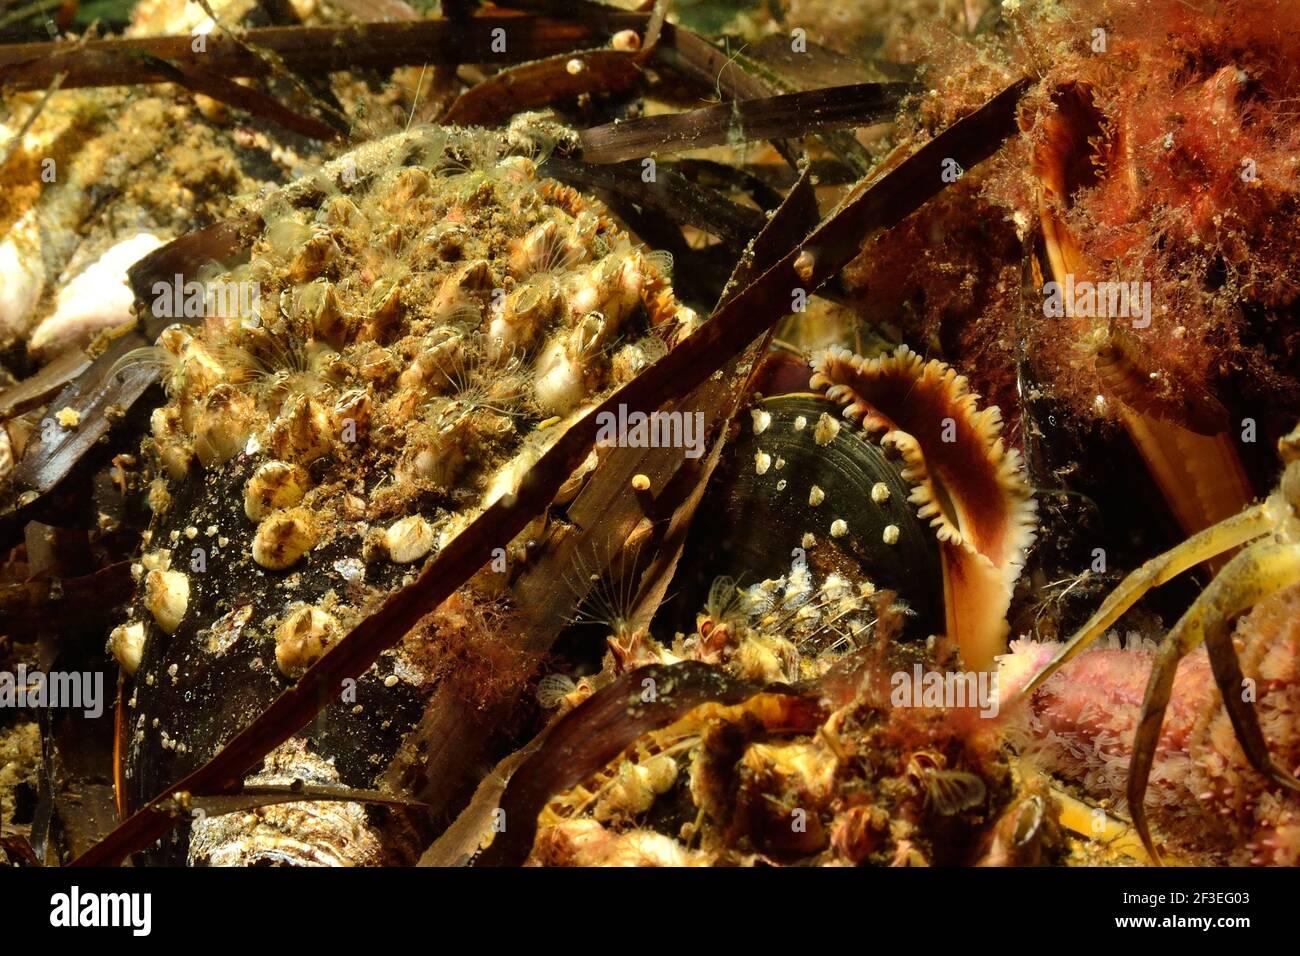 Eckernförde, Balanus crenatus auf Mytilus edulis, Gekerbte Seepocke auf Miesmuschel, acorn barnacle on common musselDeutschland, germany, Ostsee, balt Stock Photo